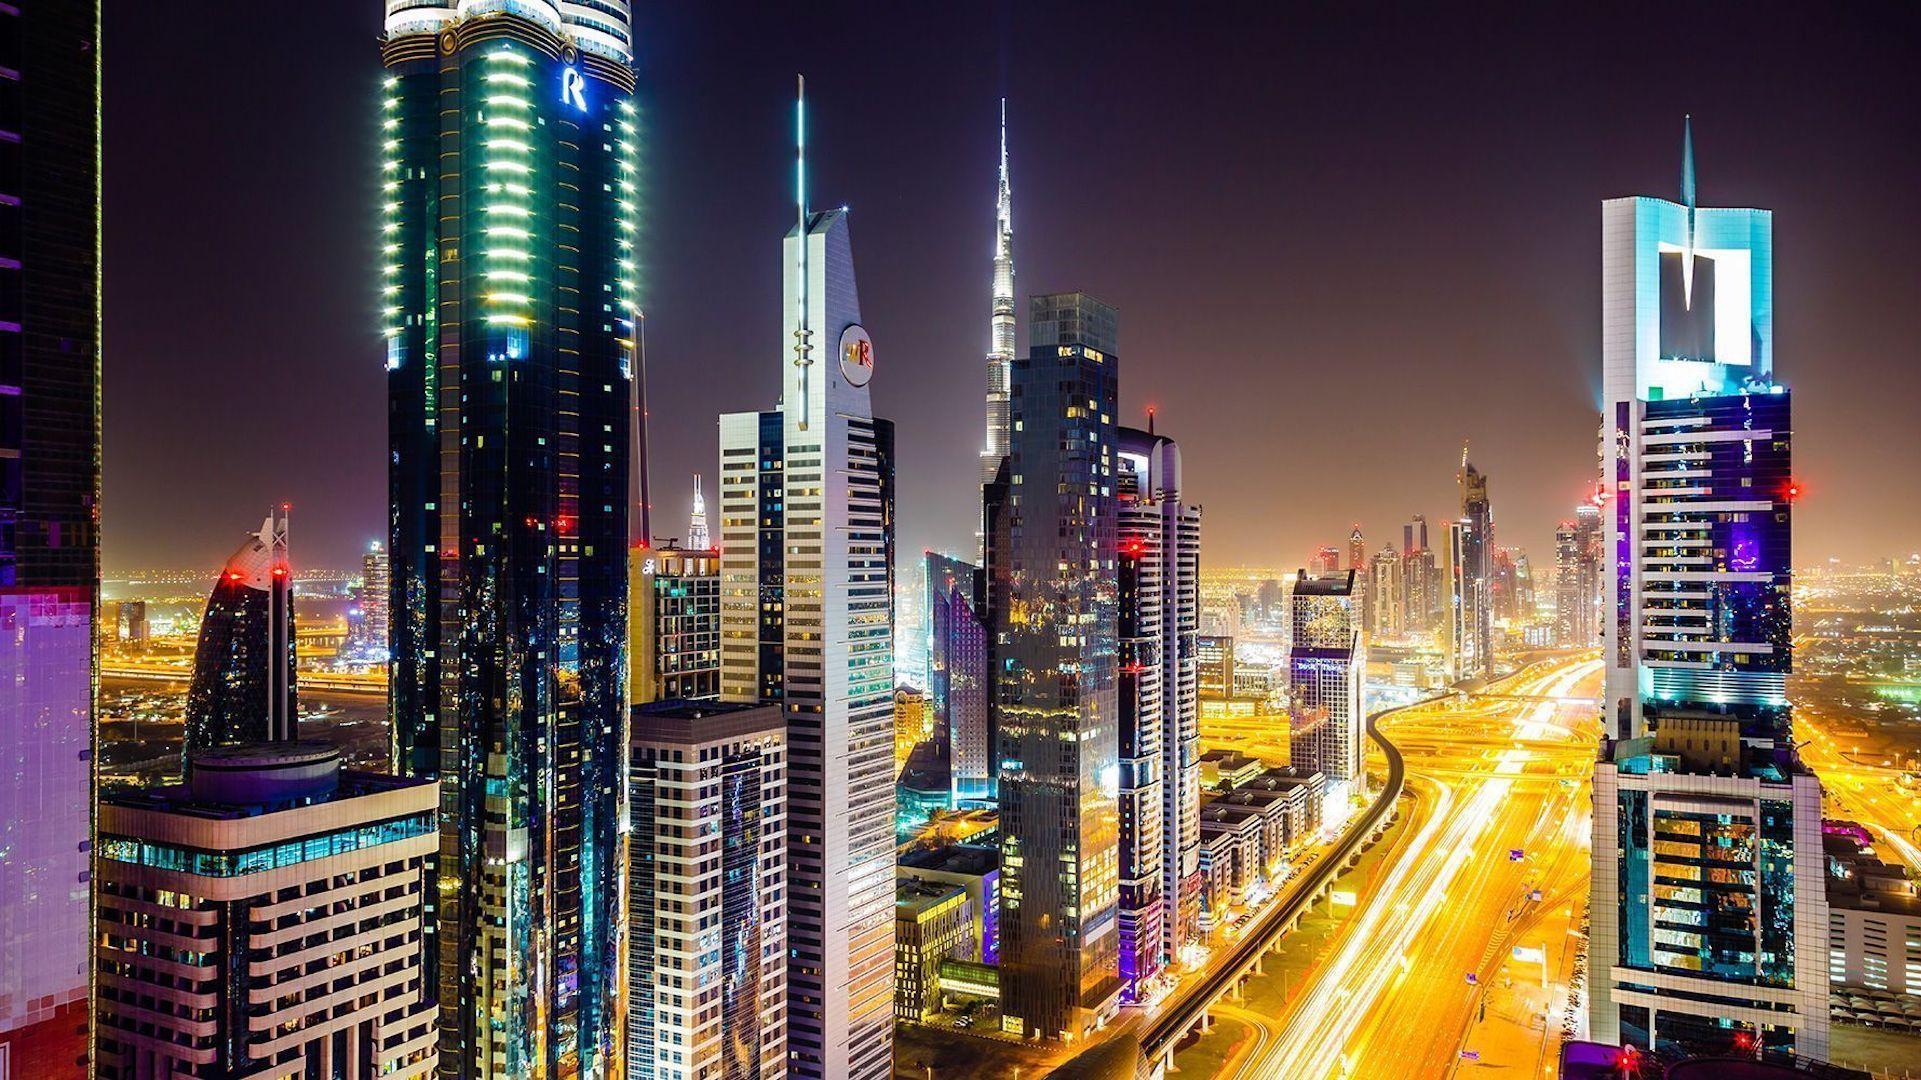 Ofertas de vuelos de Buenos Aires a Abu Dhabi, capital de Emiratos Árabes